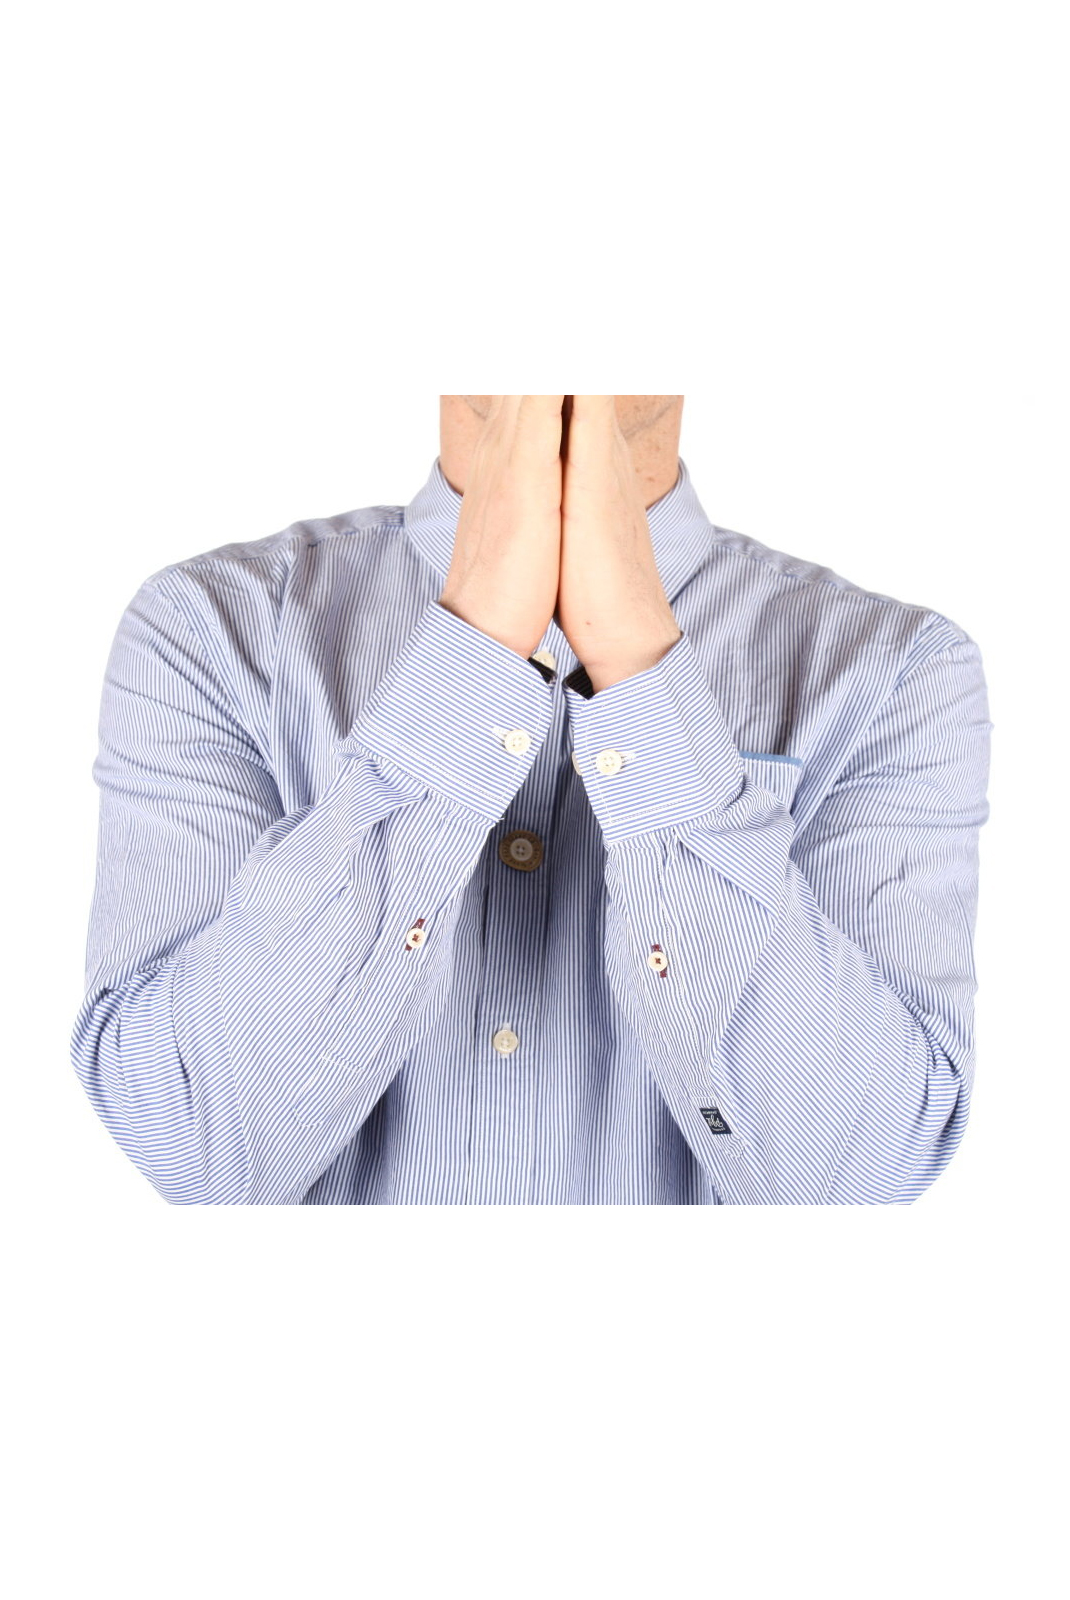 Chemises manches longues  Pepe jeans PM302576 800